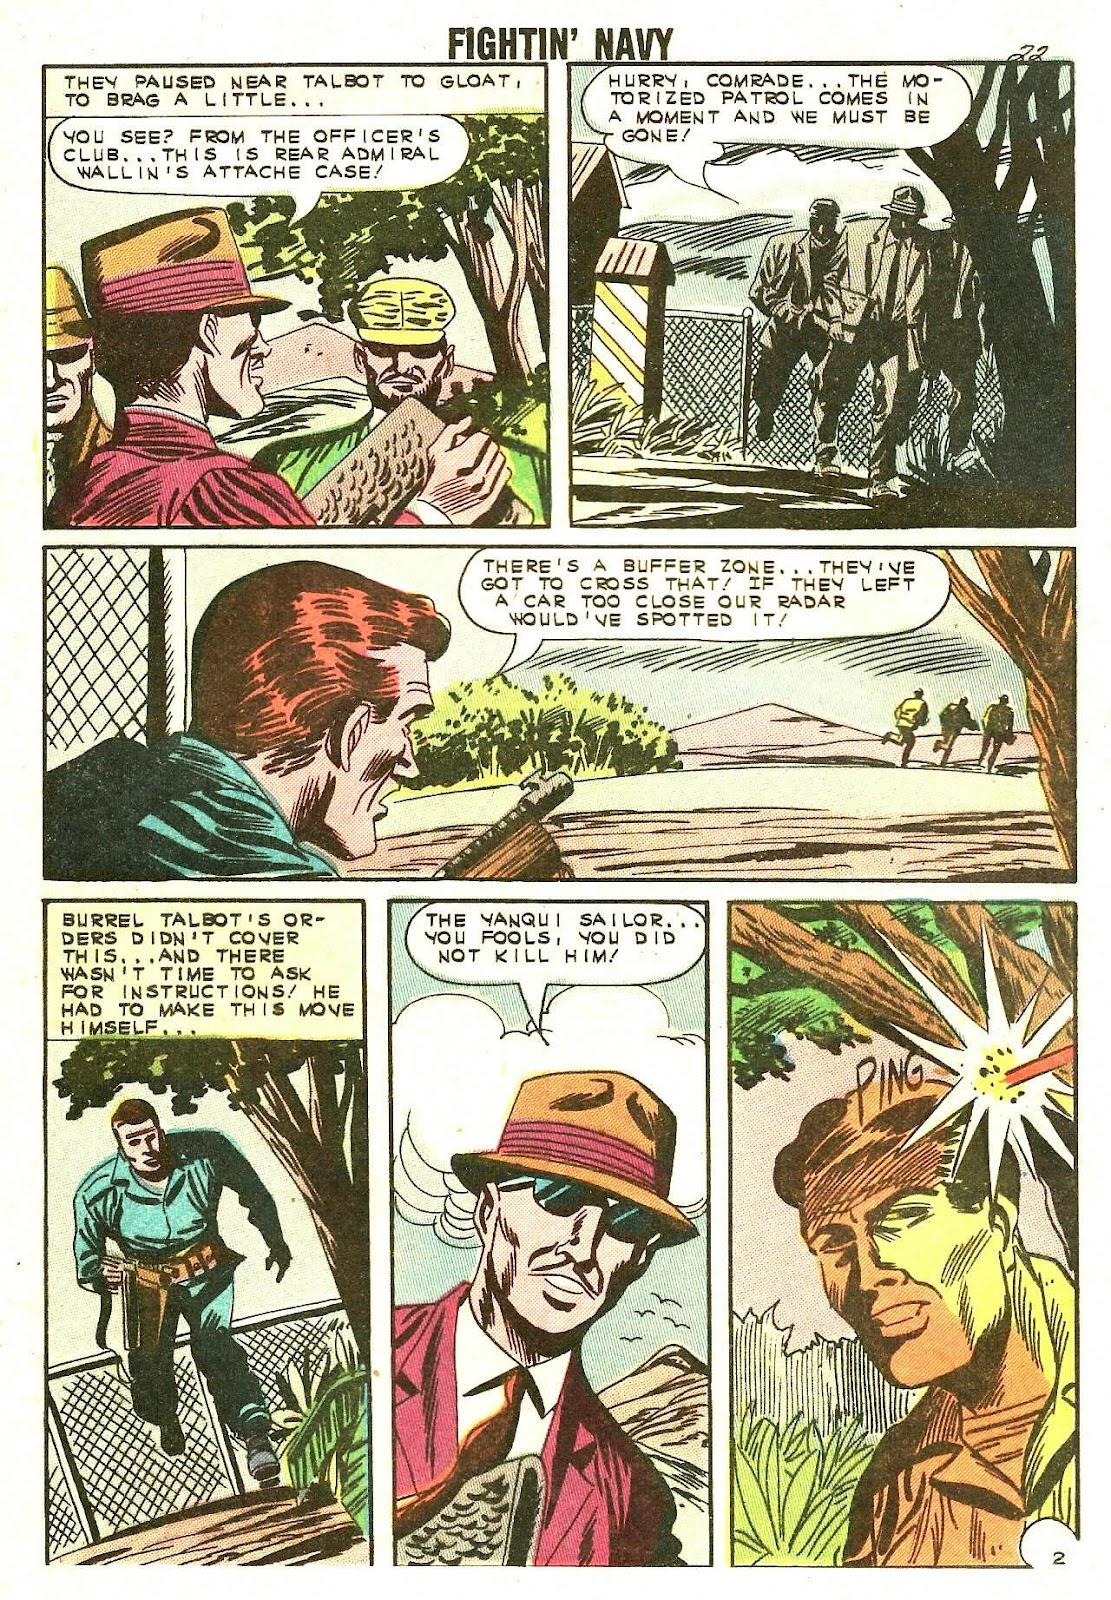 Read online Fightin' Navy comic -  Issue #110 - 24